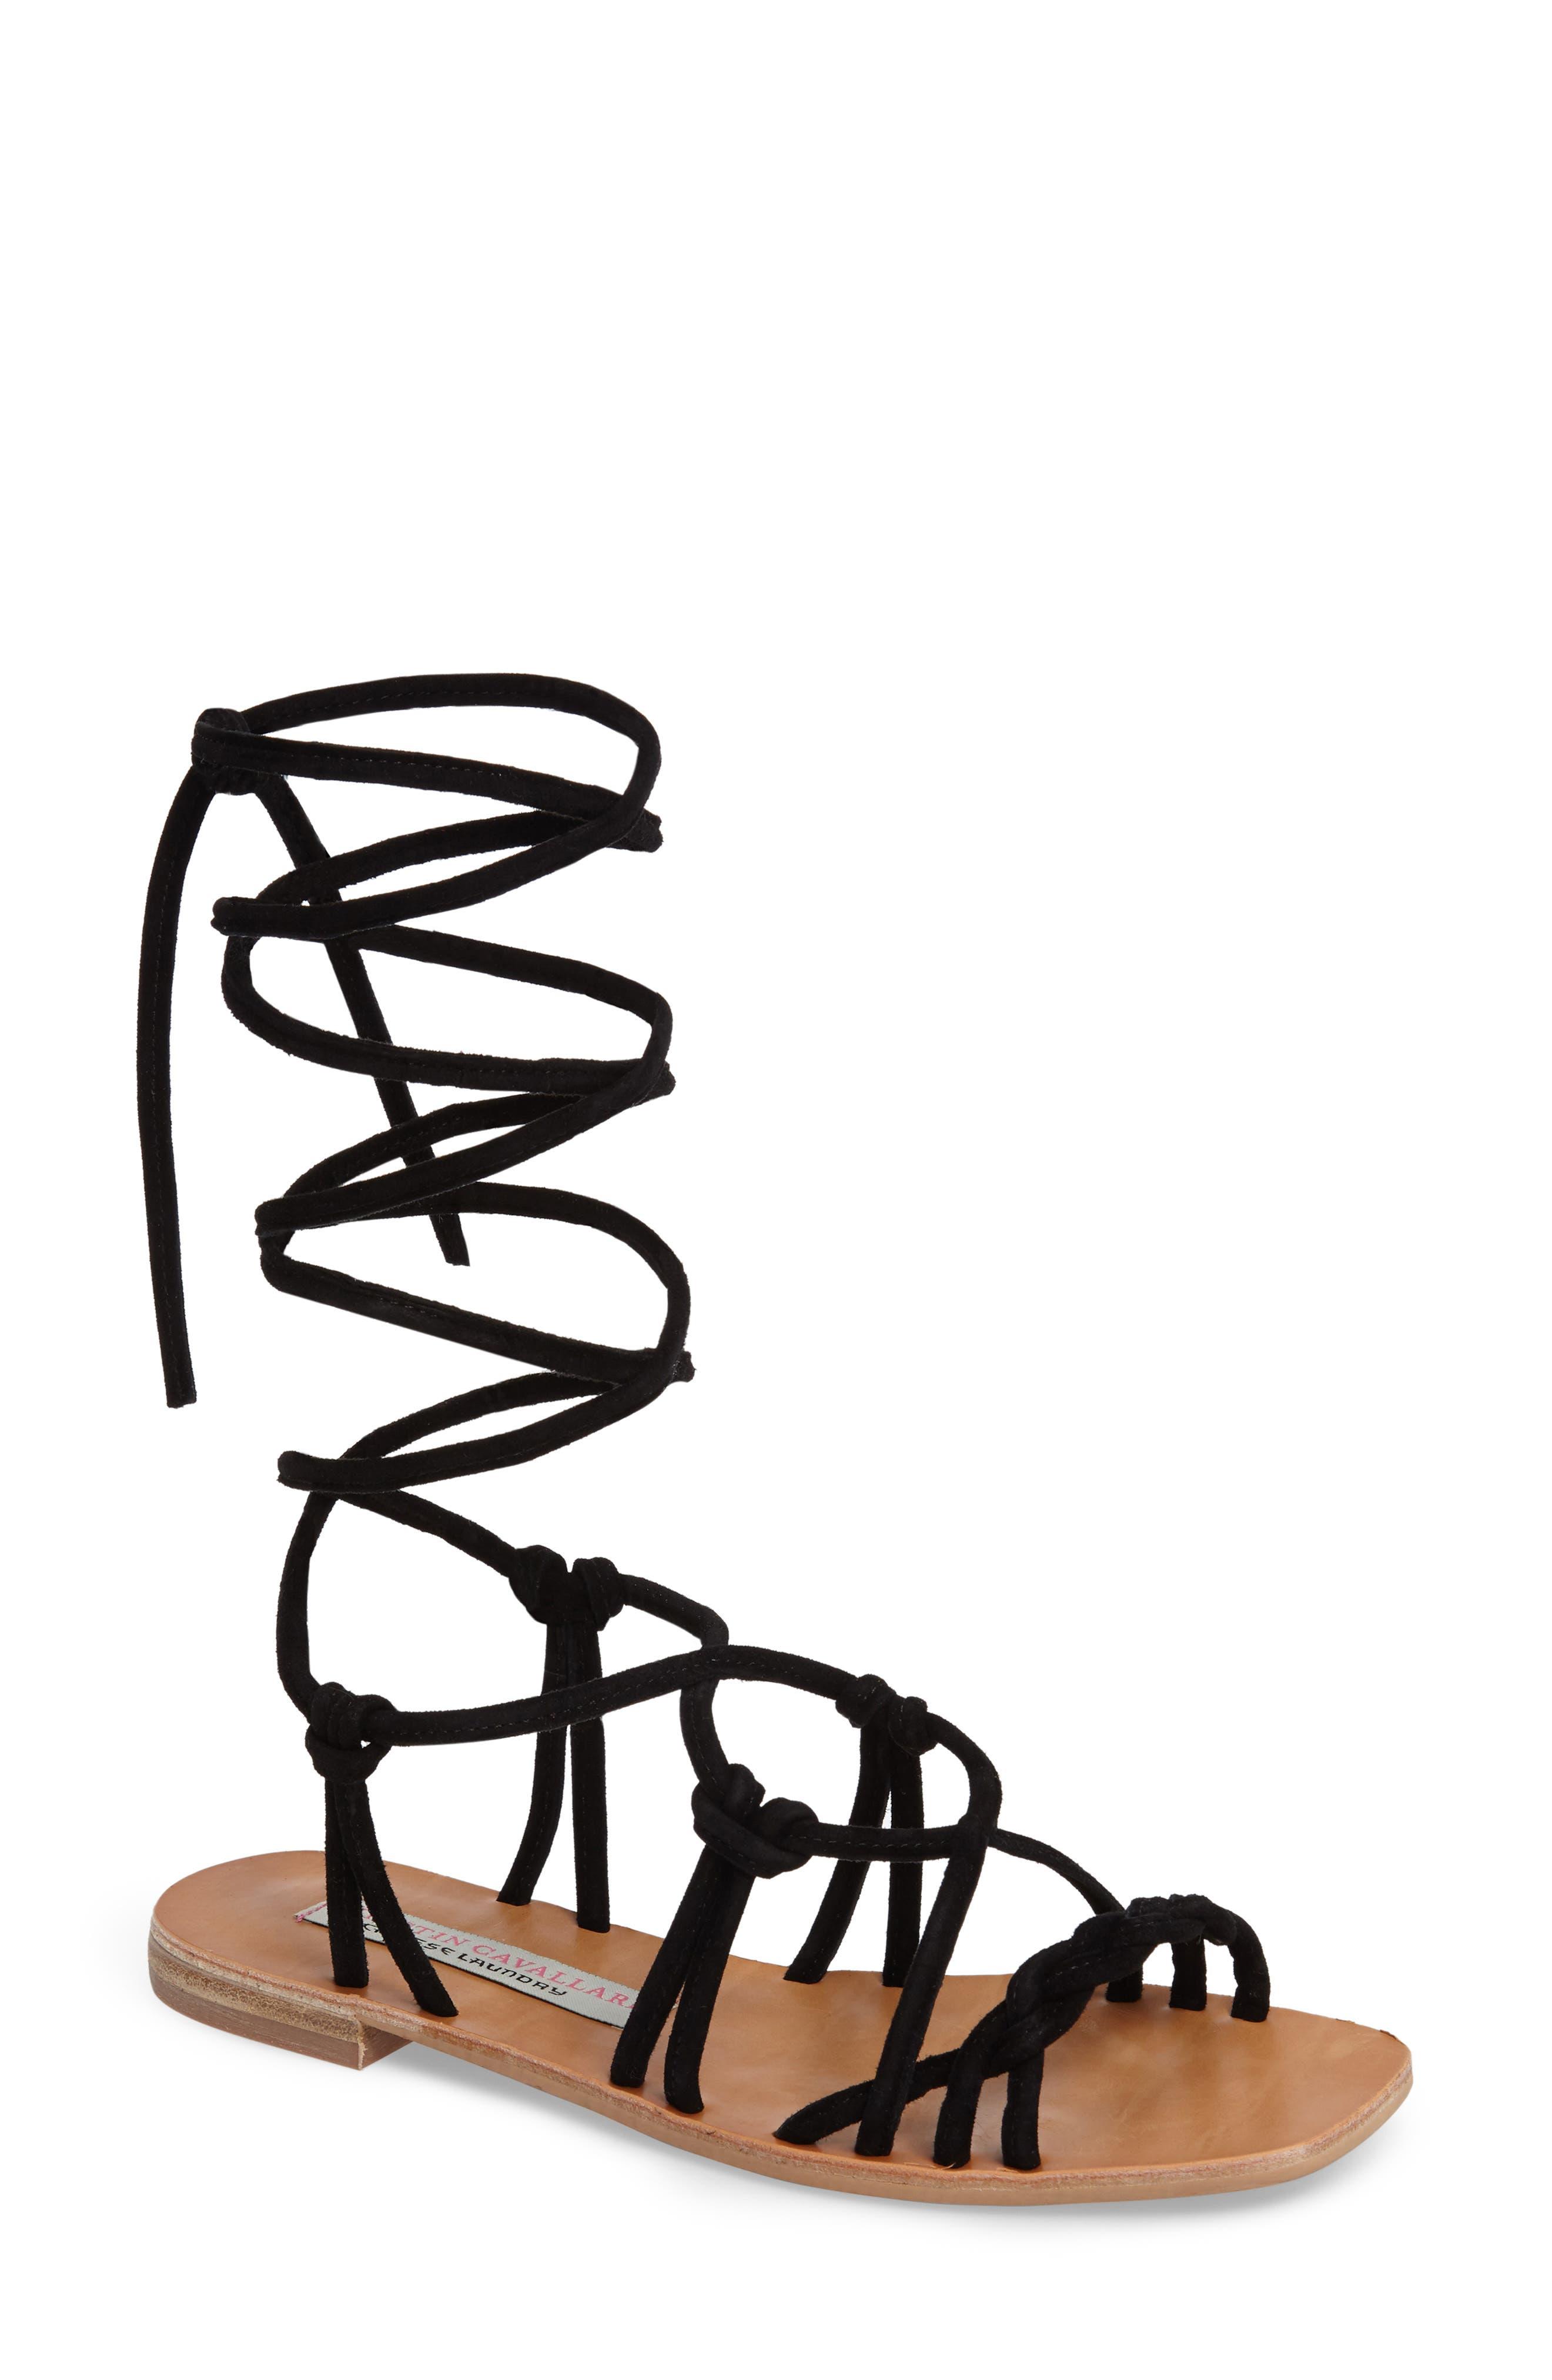 KRISTIN CAVALLARI,                             Tori Knotted Wraparound Sandal,                             Main thumbnail 1, color,                             001